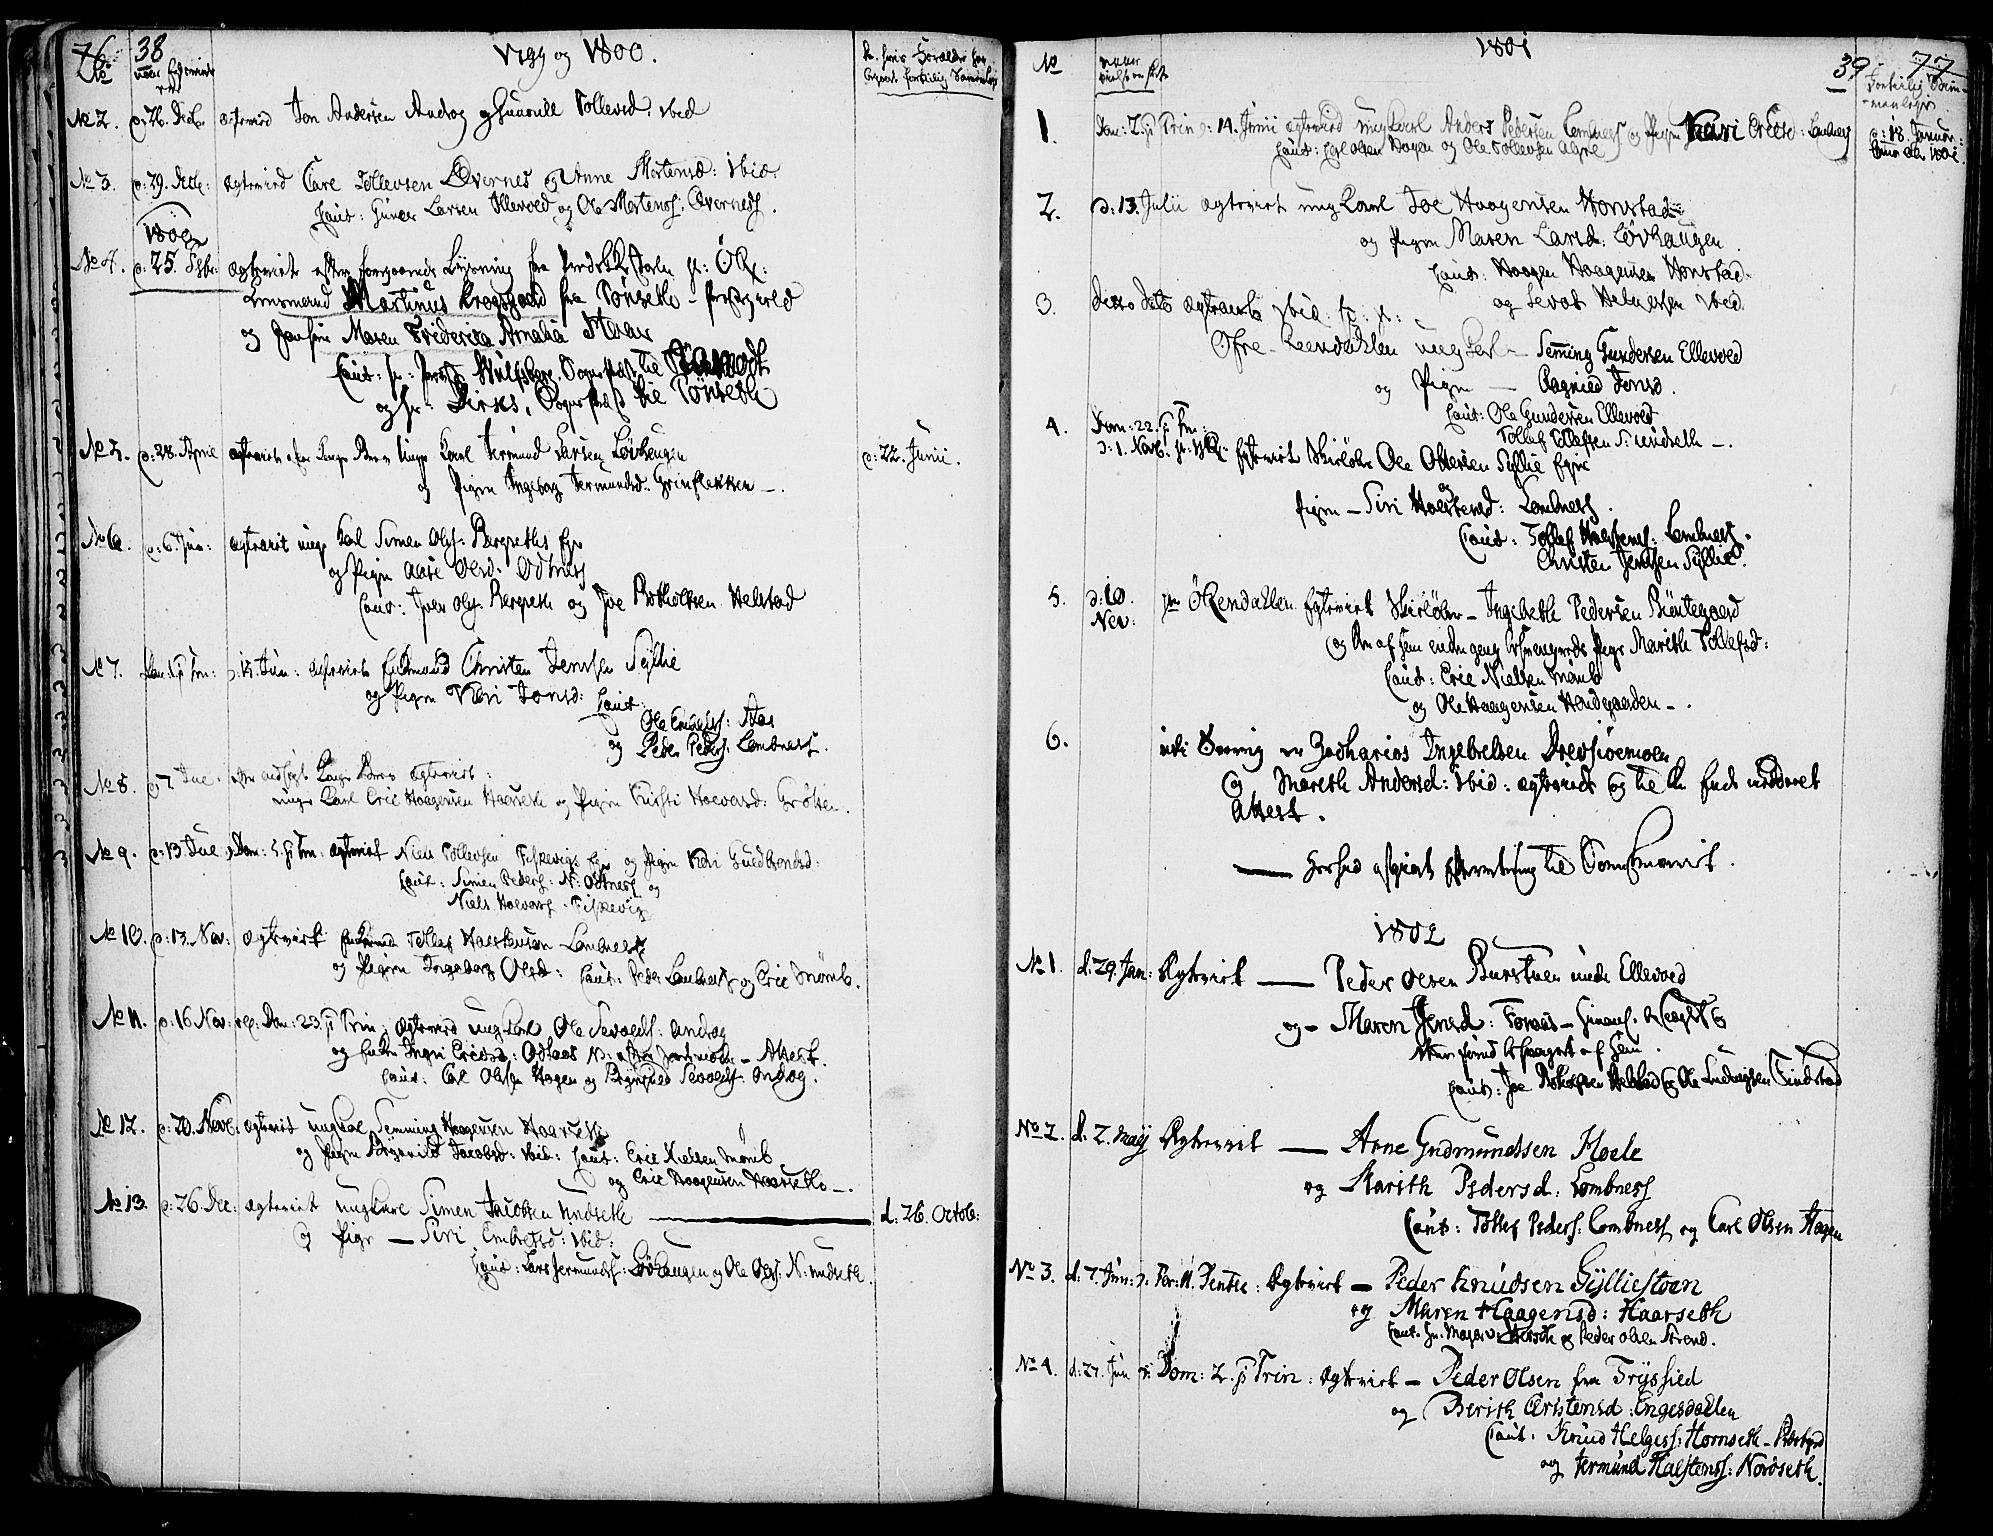 SAH, Rendalen prestekontor, H/Ha/Haa/L0002: Ministerialbok nr. 2, 1788-1814, s. 38-39